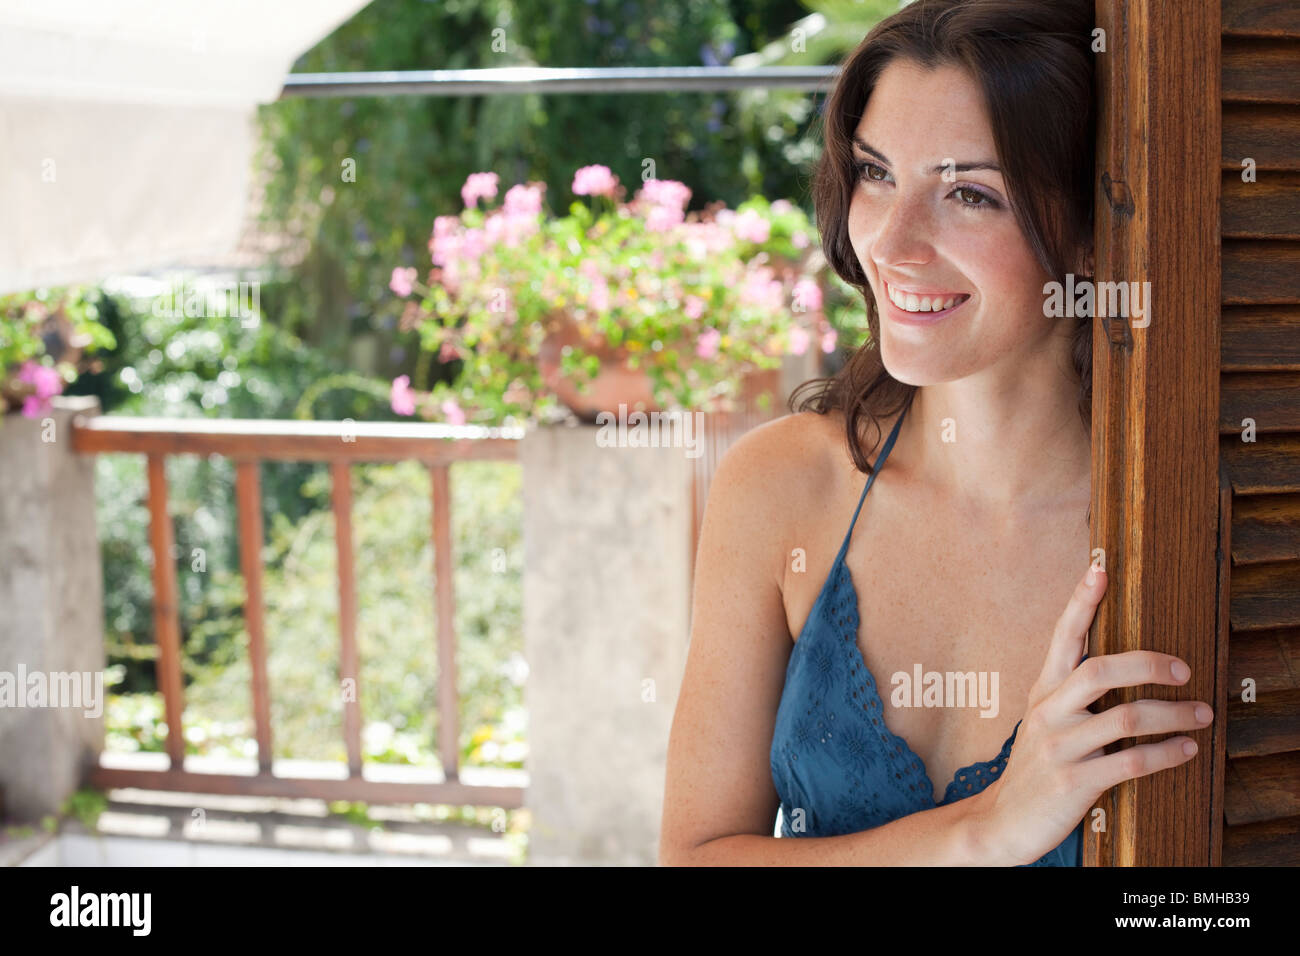 Frau Jalousien zur Terrasse öffnen Stockbild